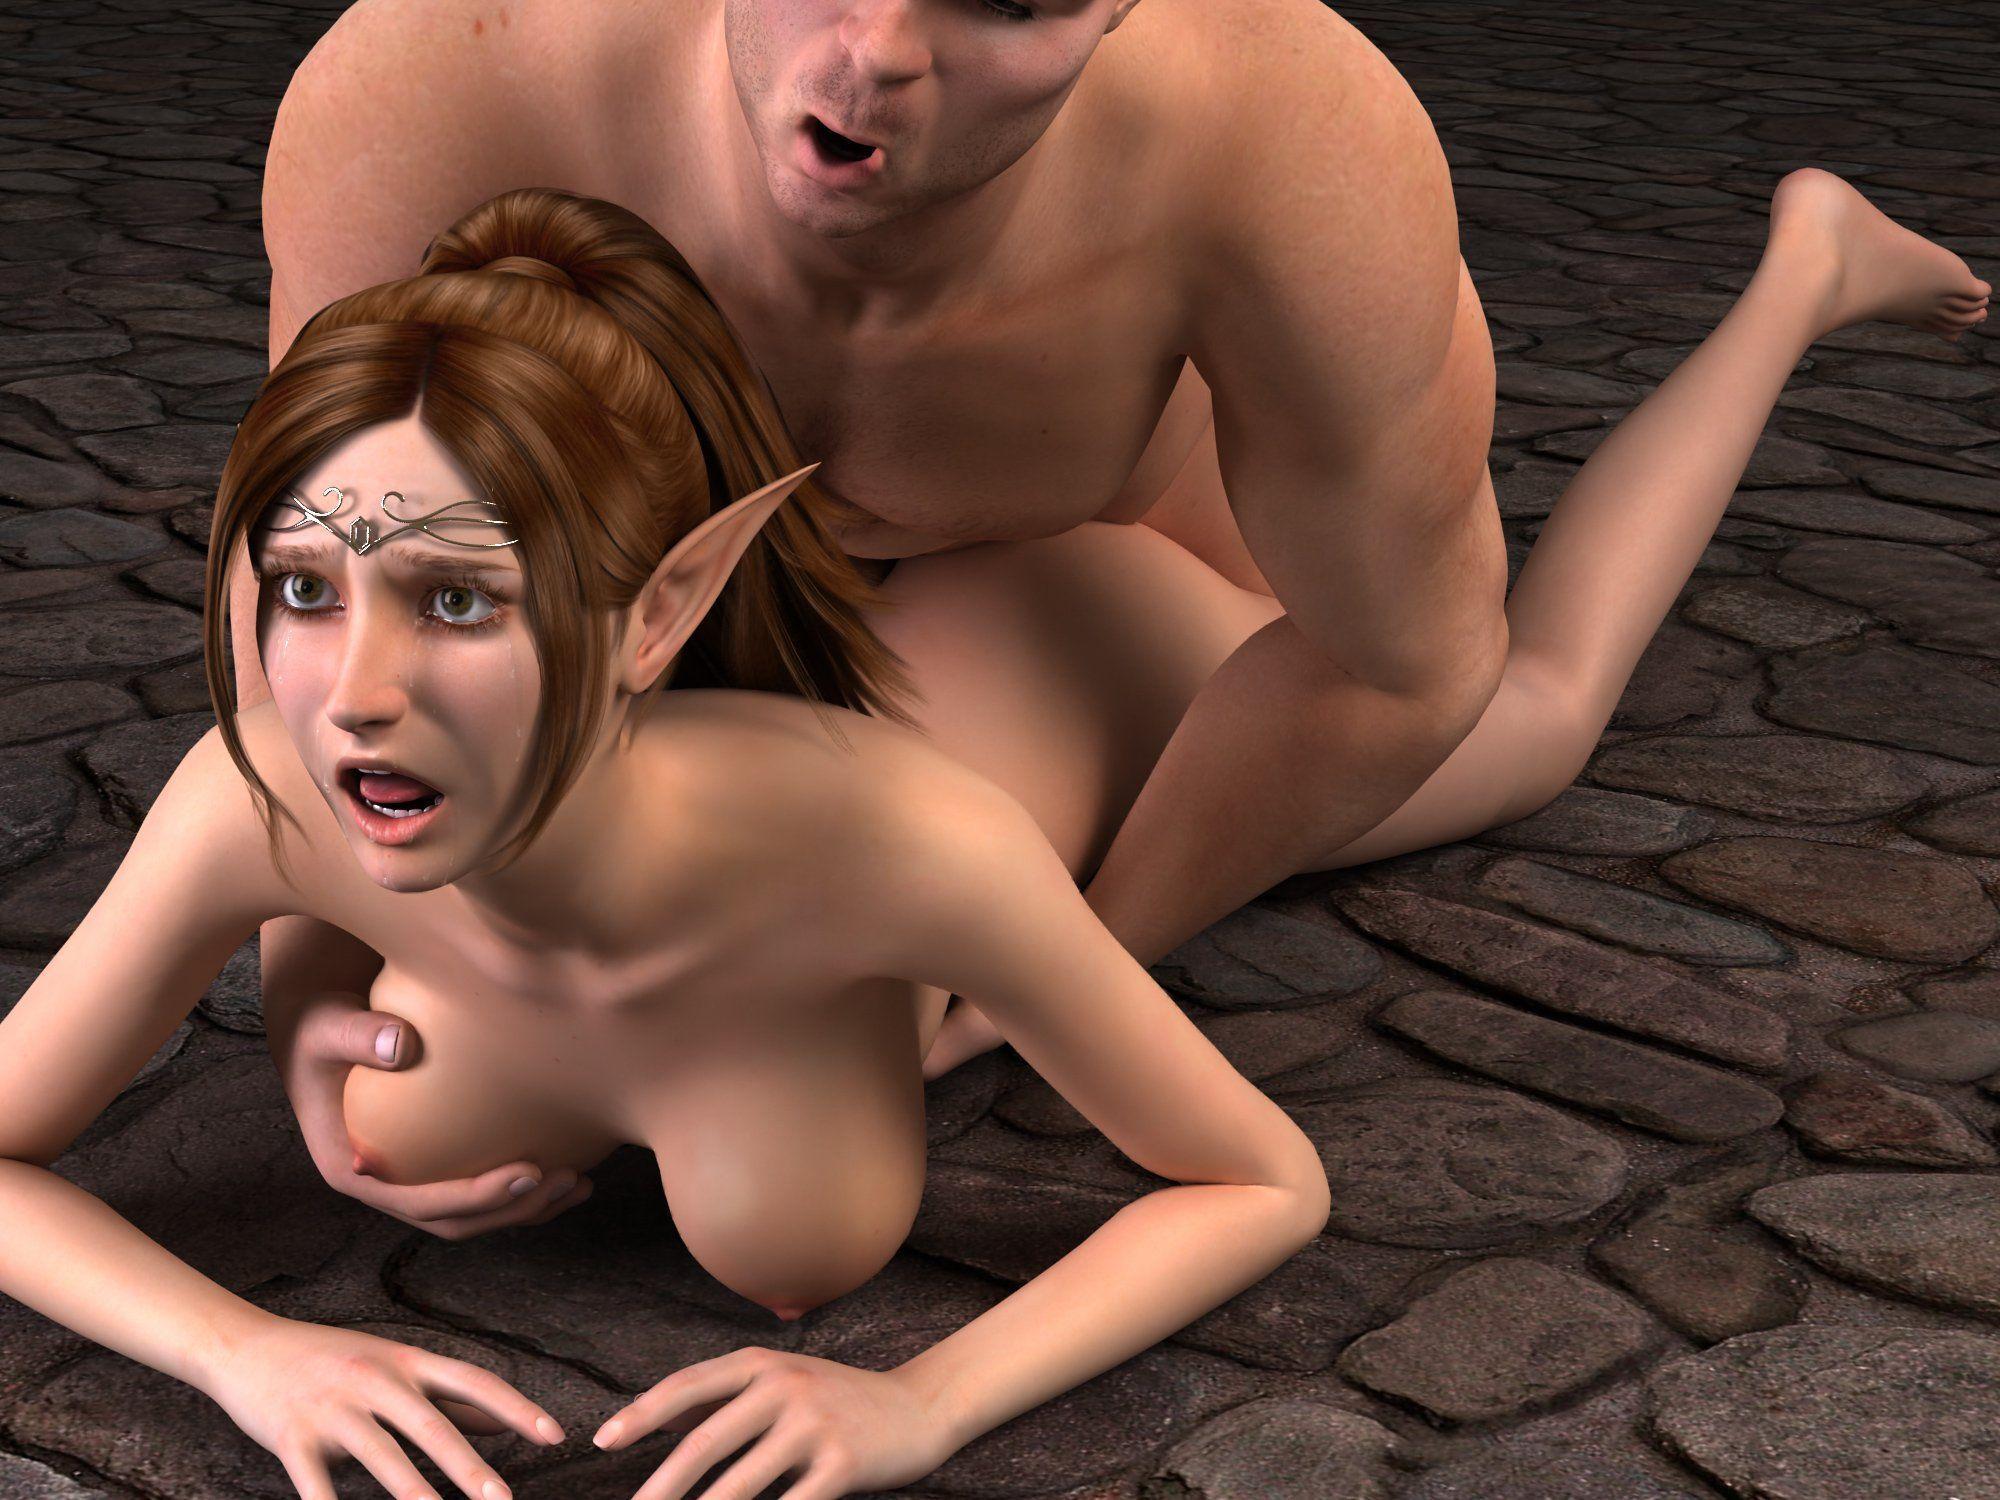 Animal Fucking Woman Porn hot female elves nude captions . 40 new sex pics.